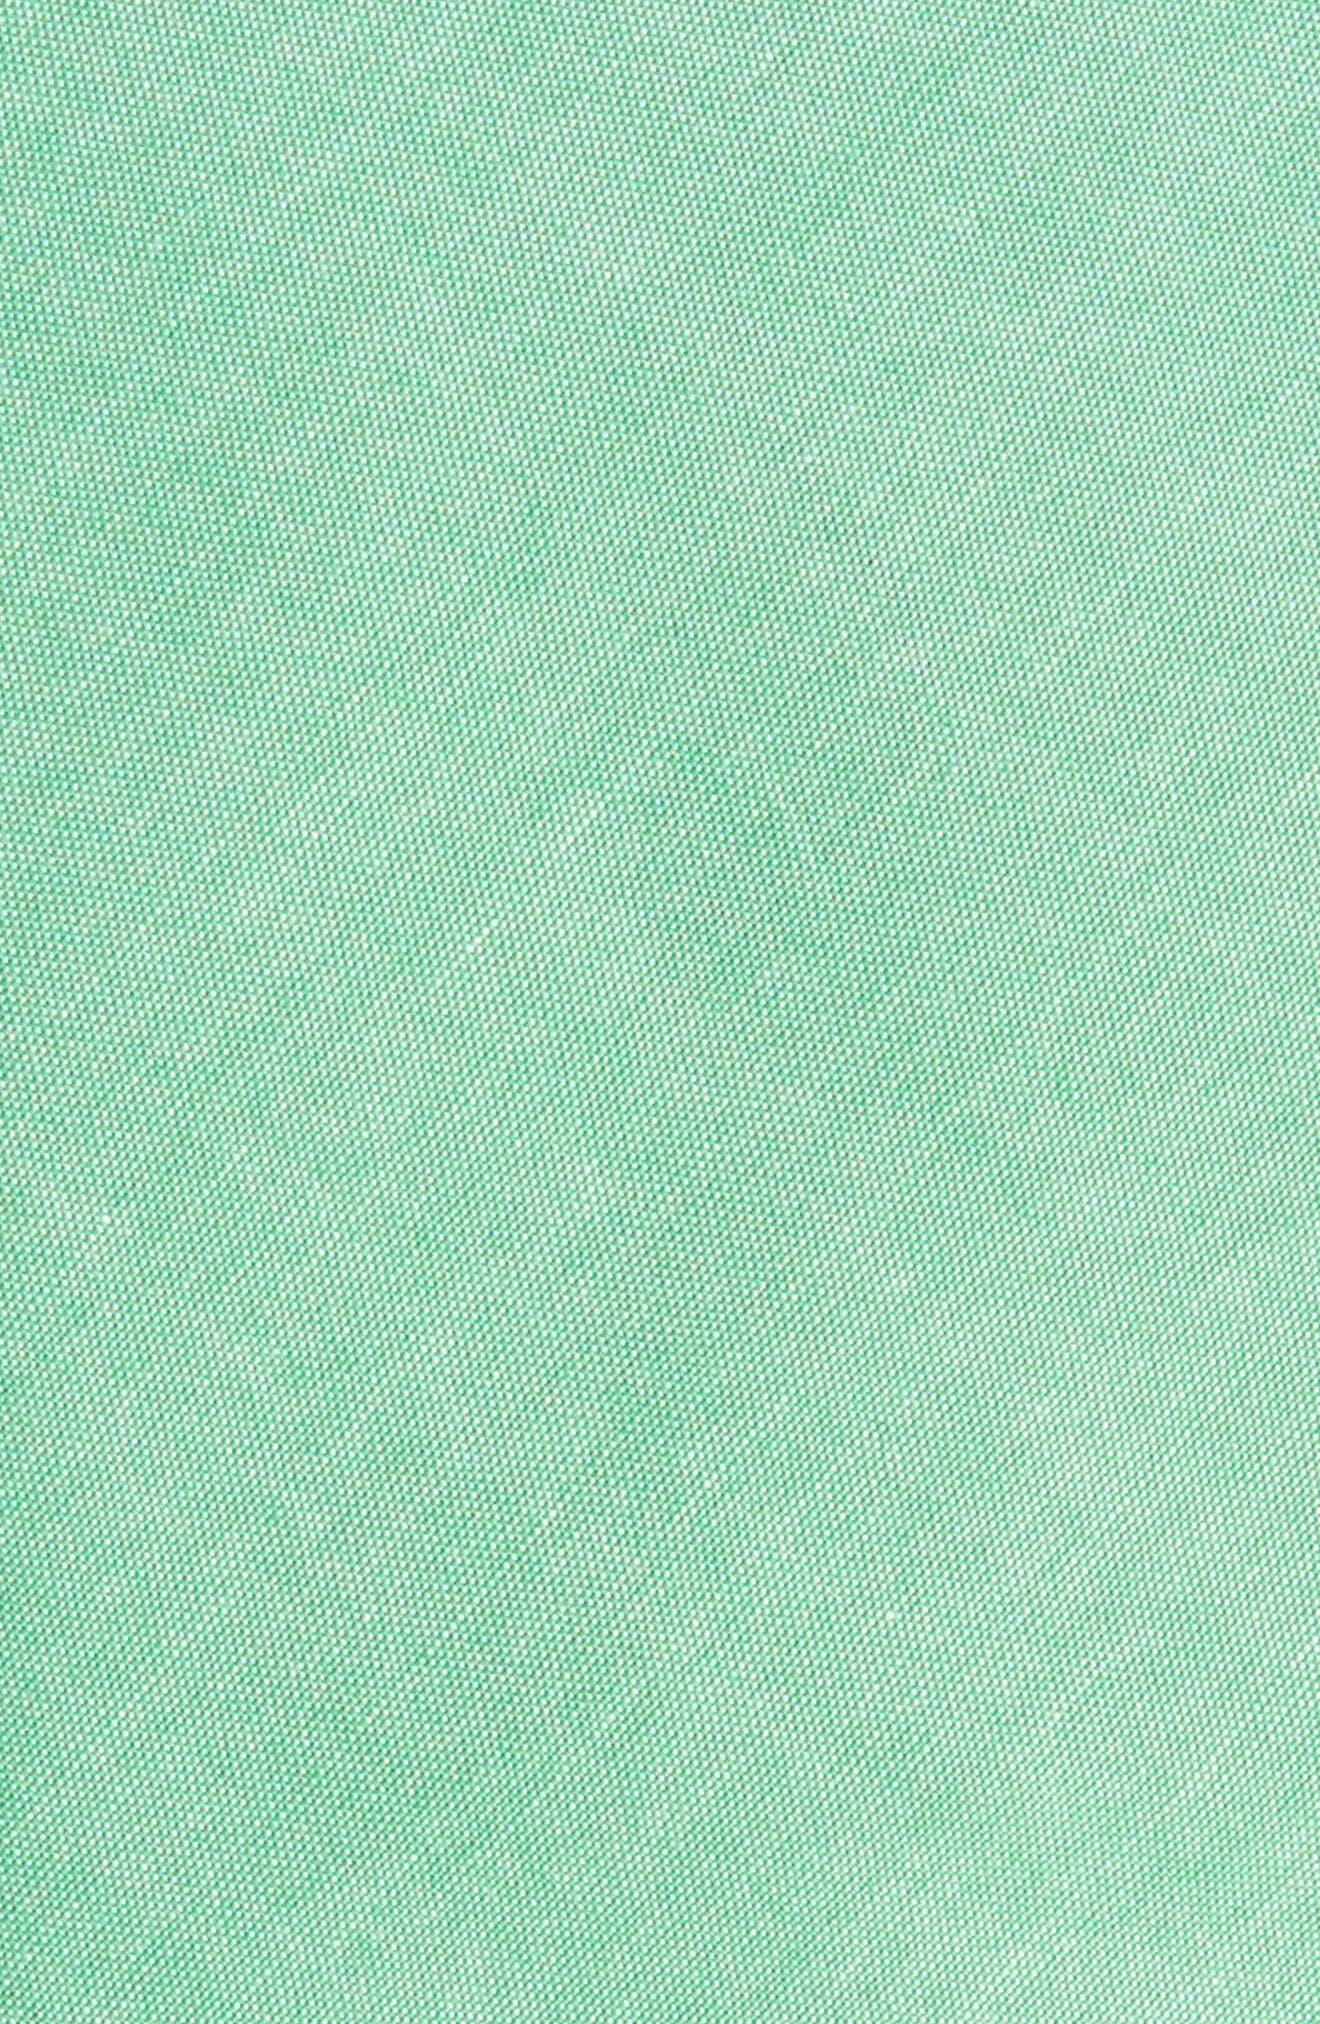 Desmond Solid Cotton Skinny Tie,                             Alternate thumbnail 2, color,                             334